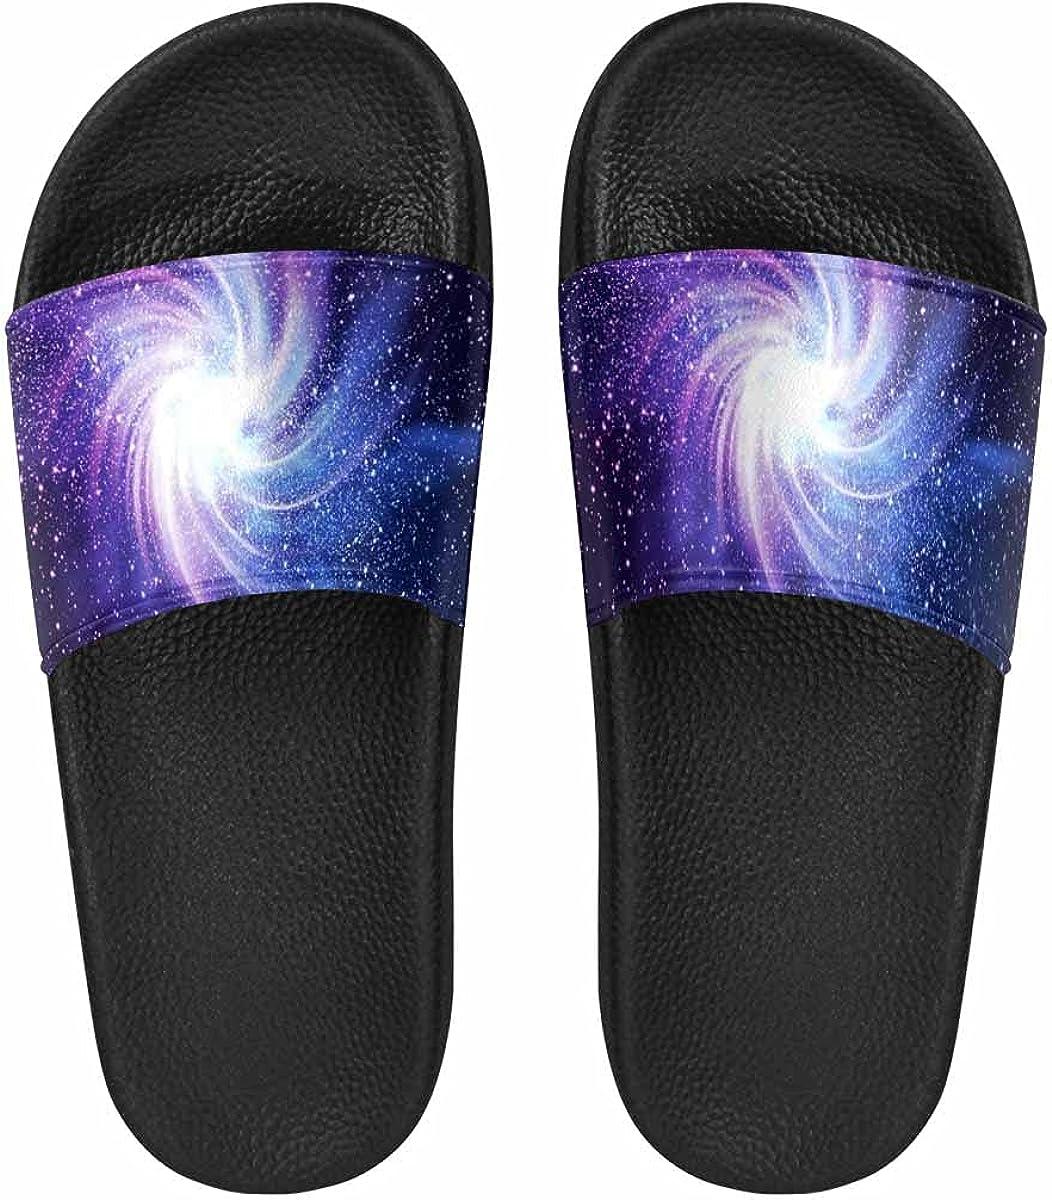 InterestPrint Funny Smiling Star and Sleeping Moon Women's Slide Sandal Summer Beach Travel Sandal Indoor Shoes